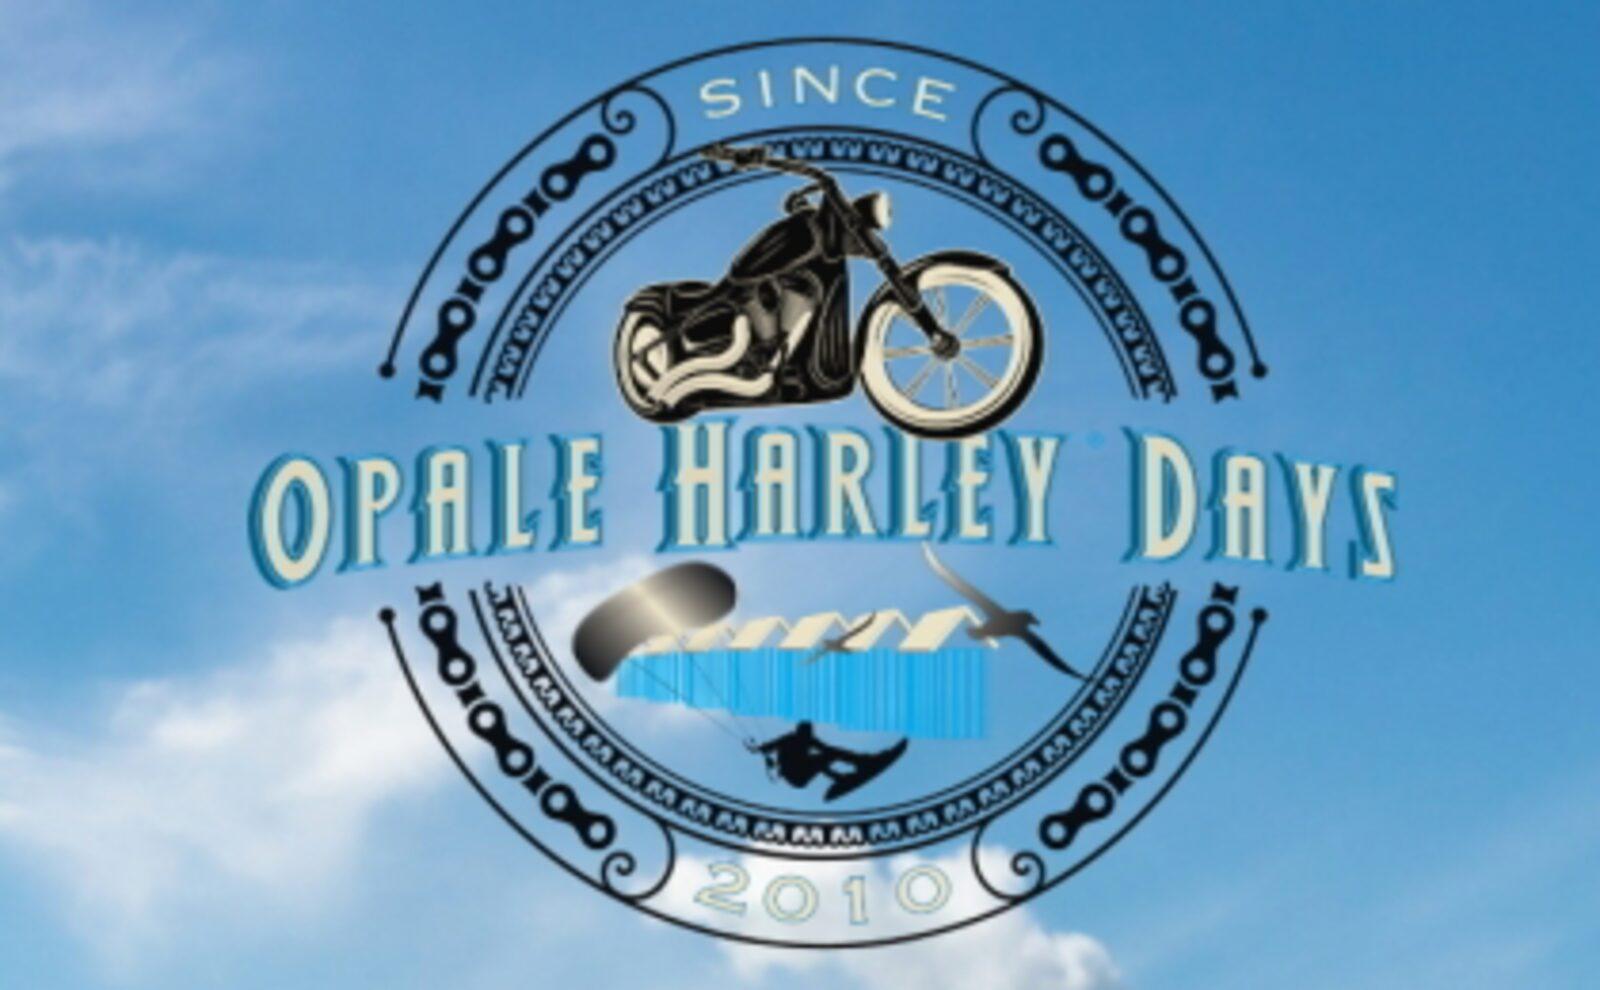 Opale Harley Days 2020